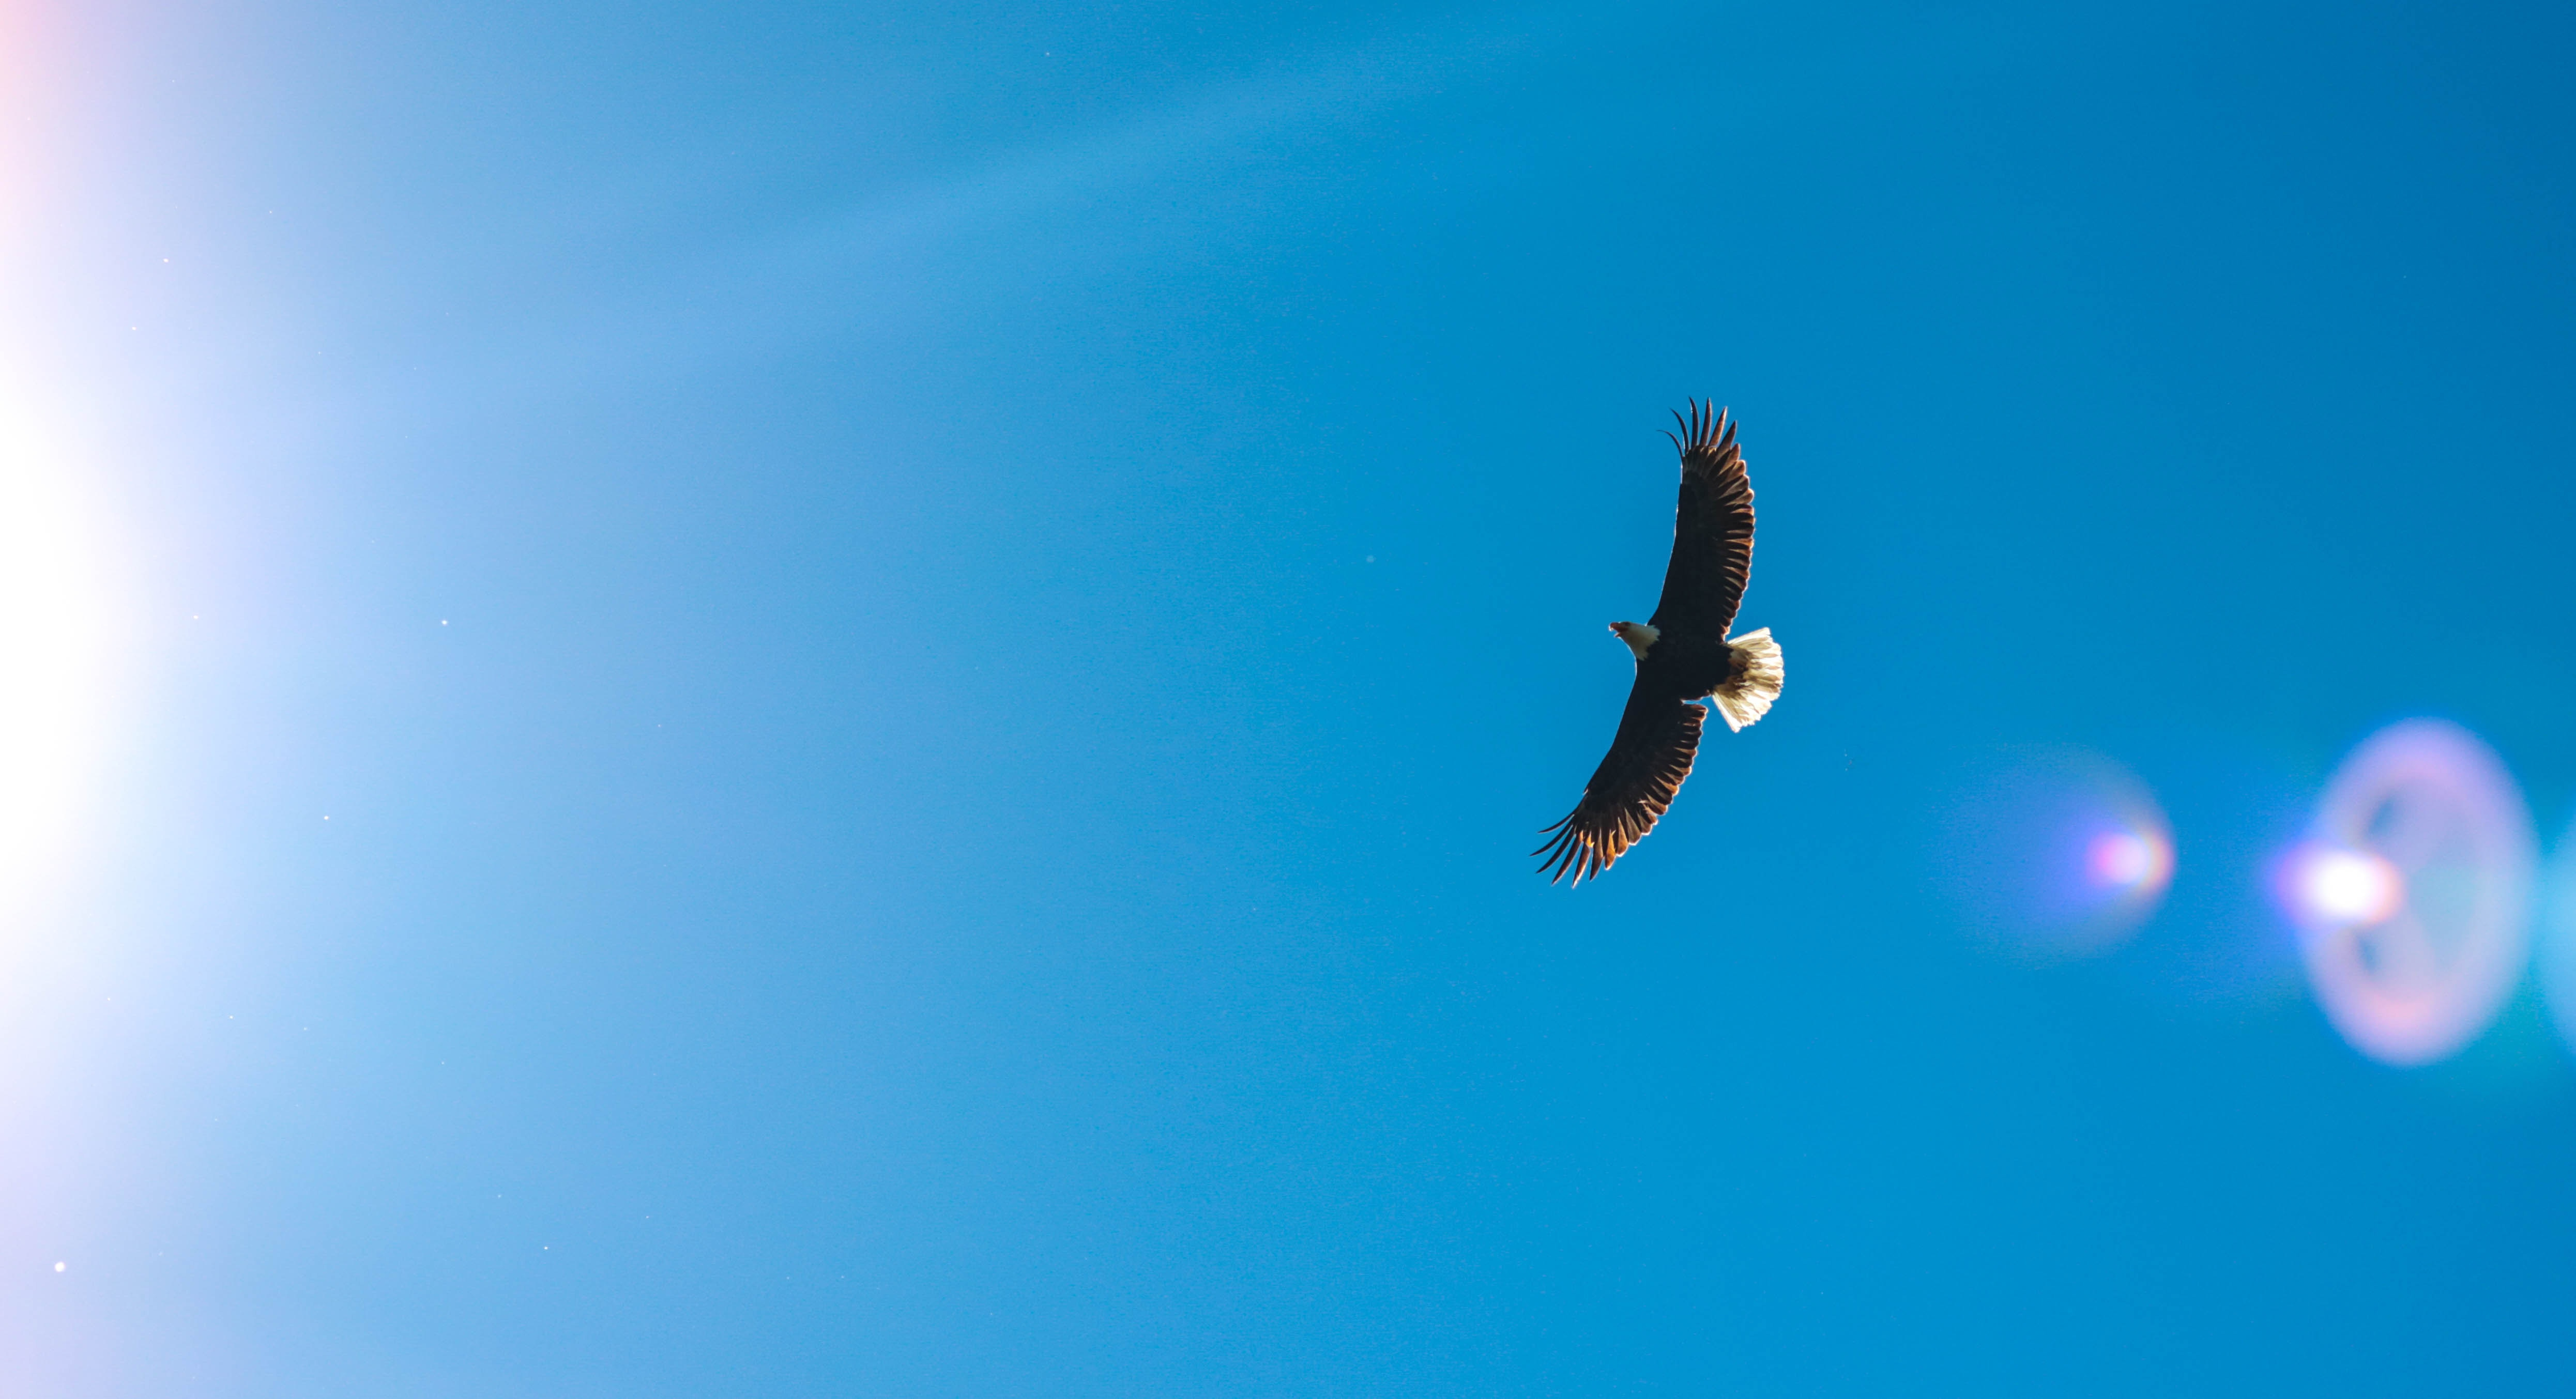 Graceful early flying in a blue sky